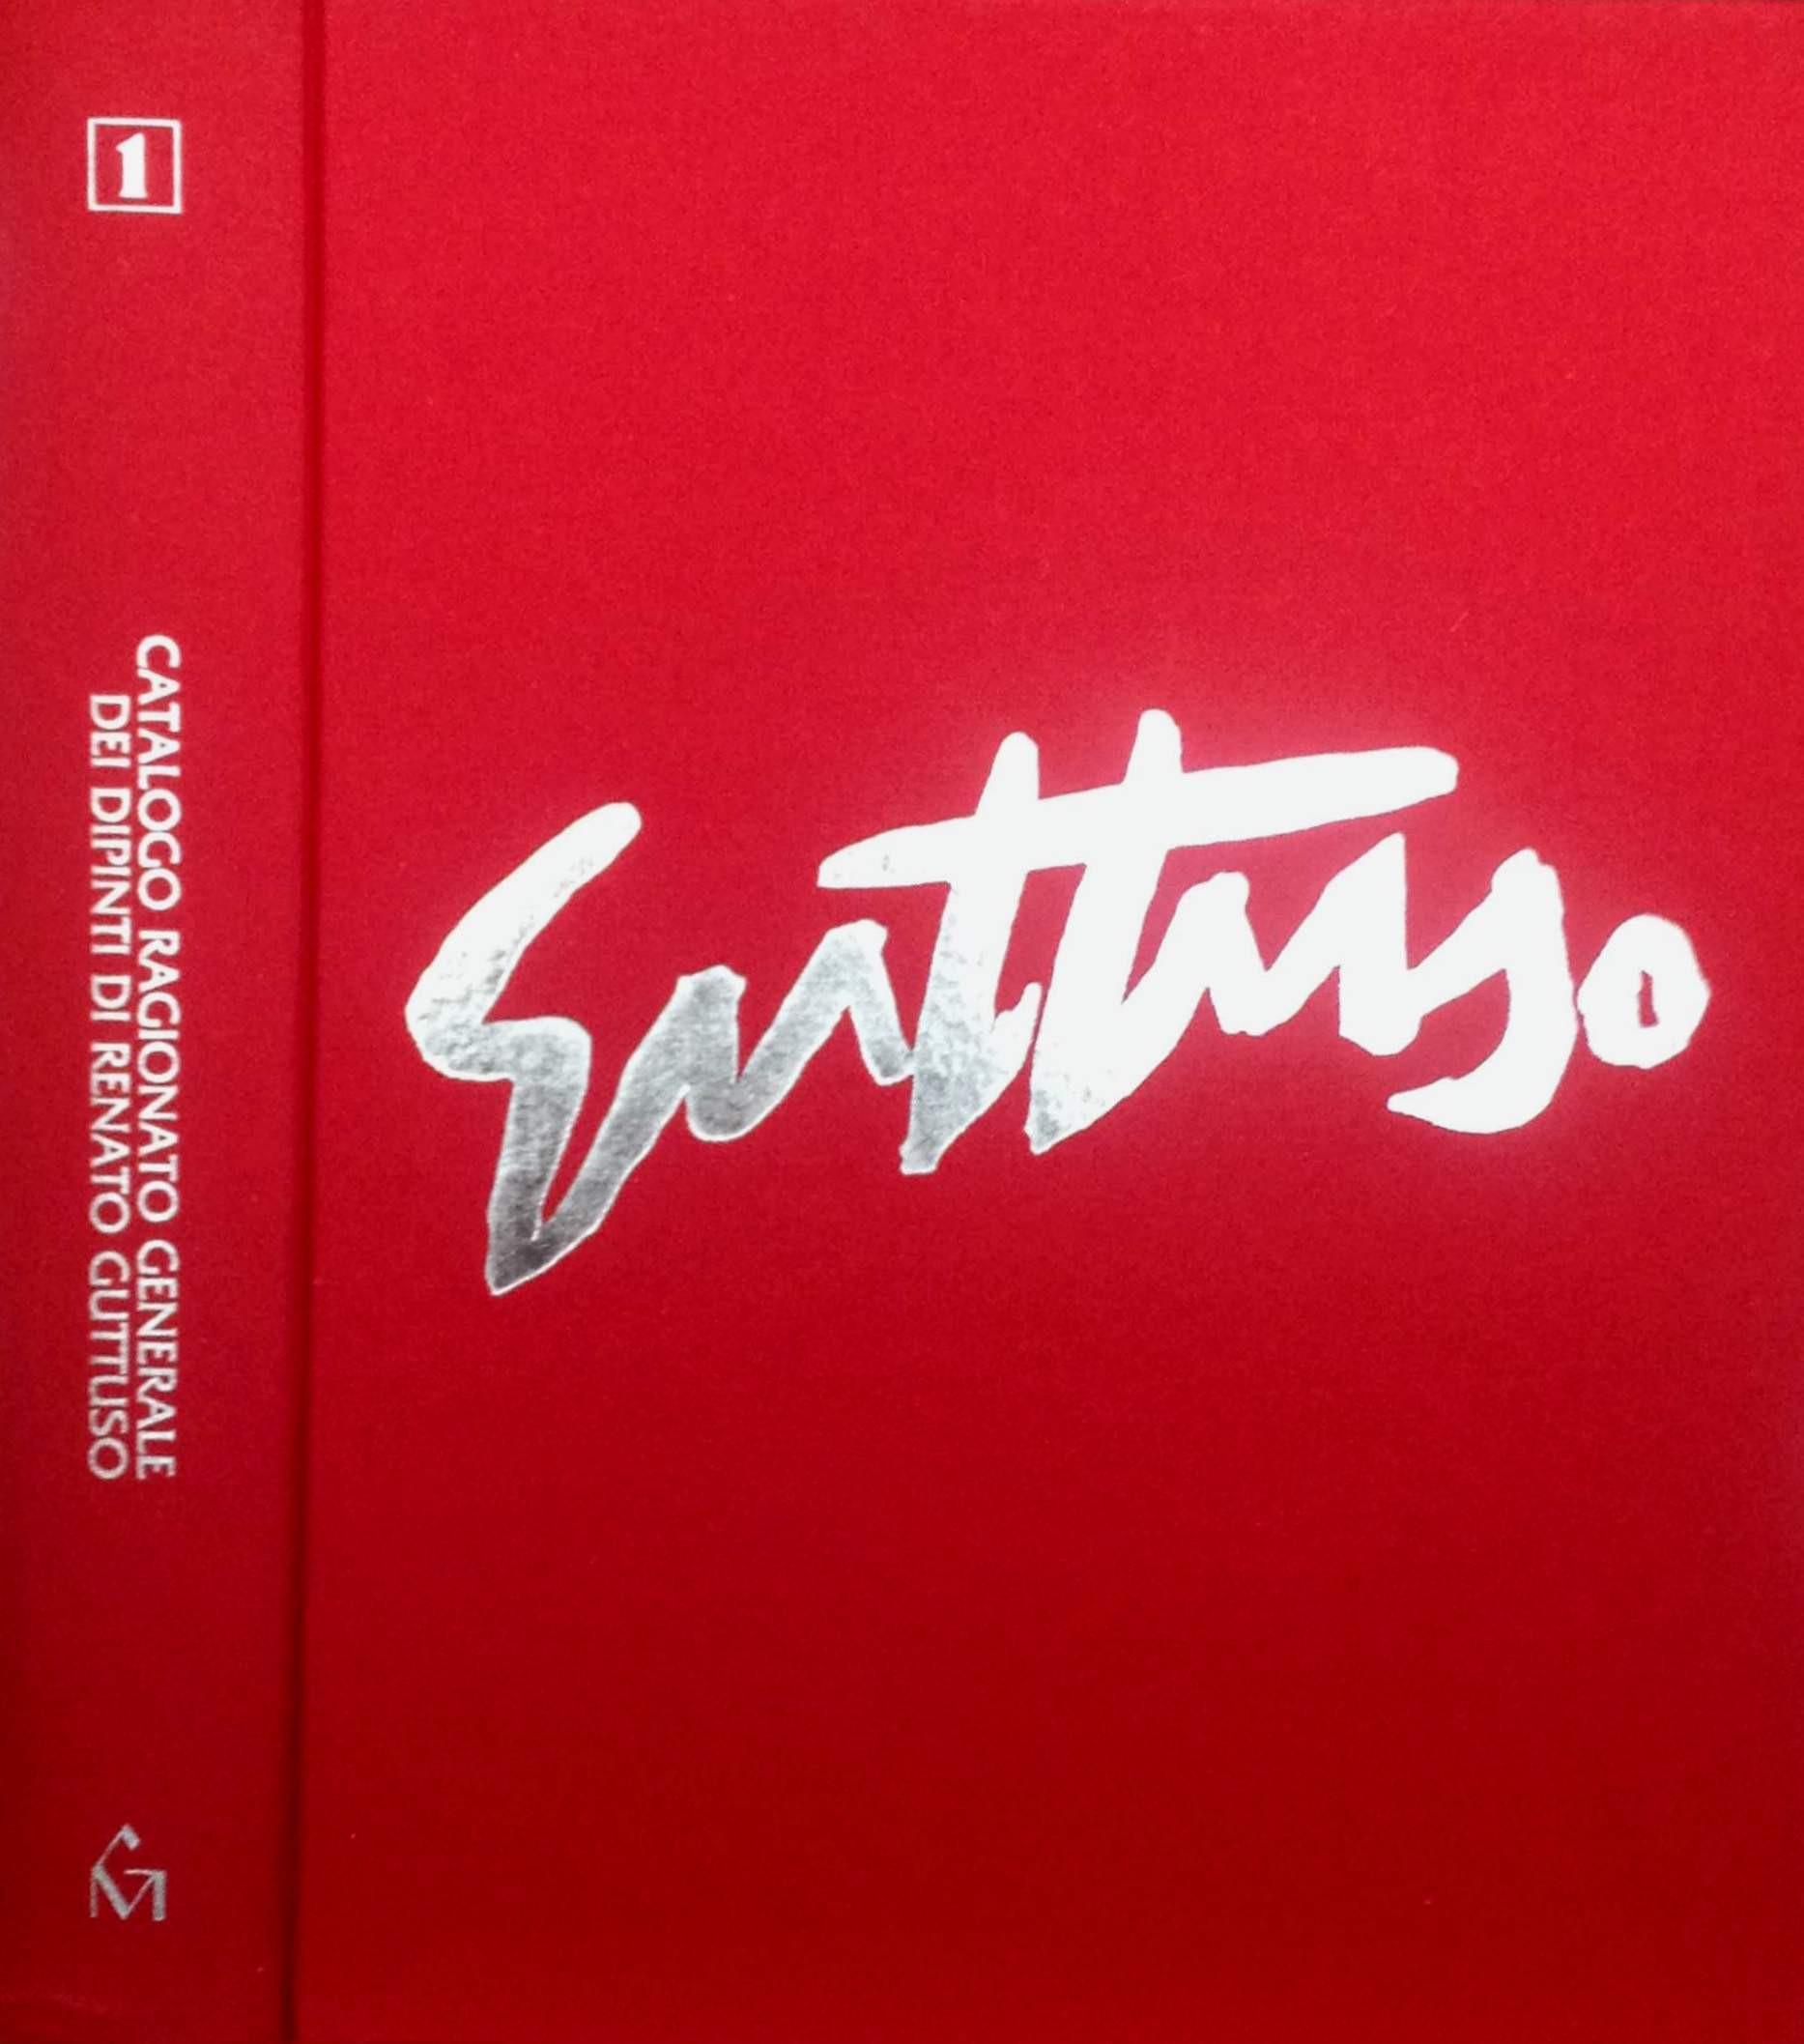 39 Catalogo Razonado Renato Guttuso Vol I II III